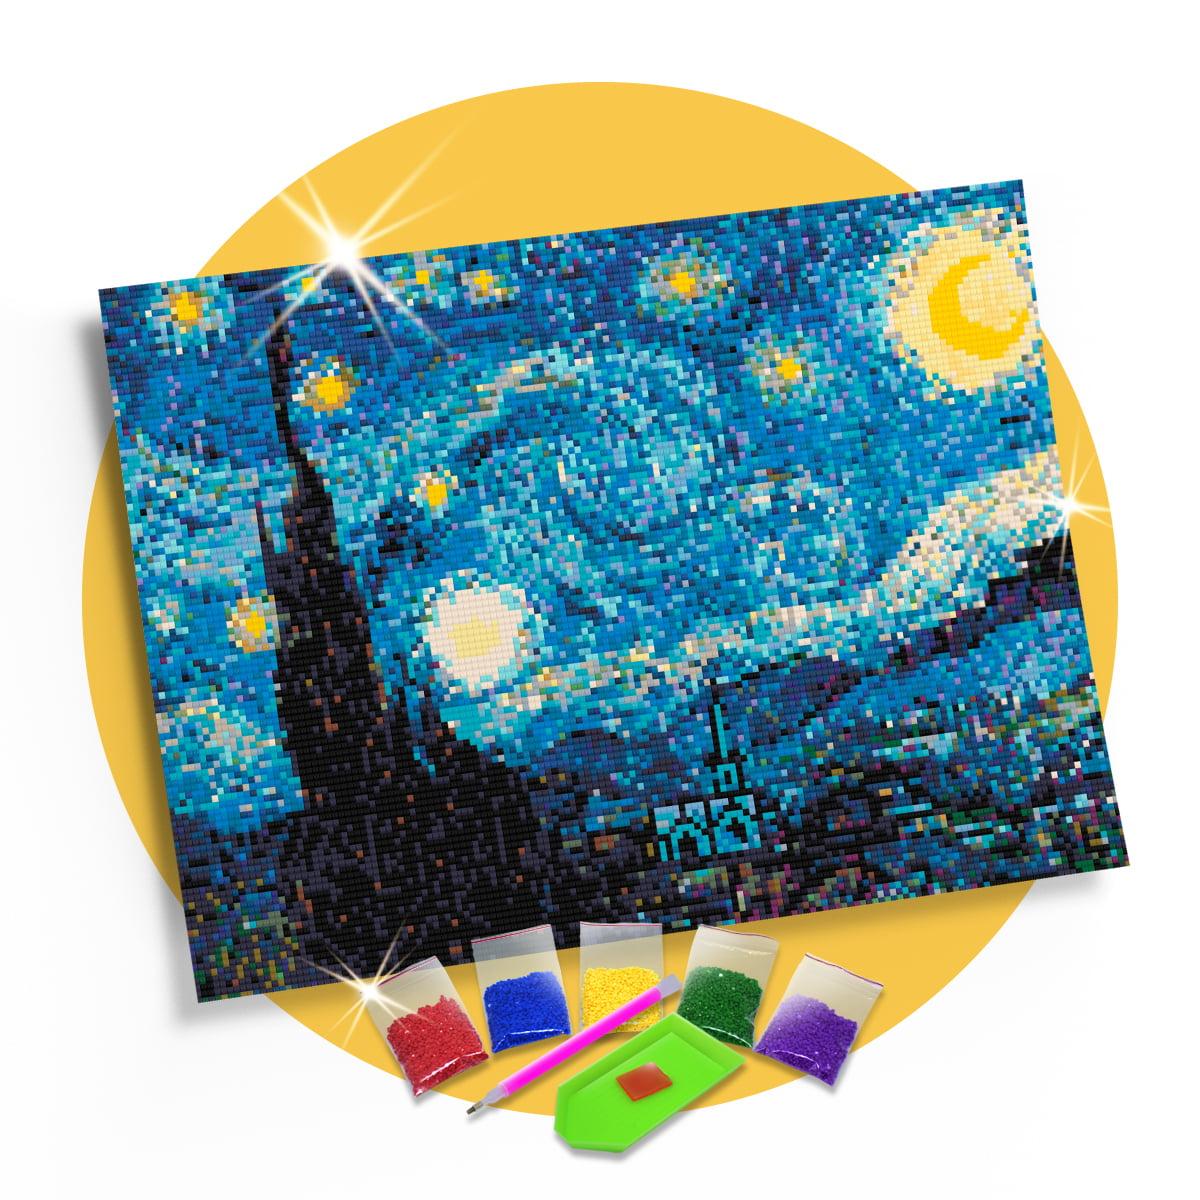 Kit Pintura com Diamantes | Tela Noite Estrelada - 42 x 30 cm - Diamante Redondo | Diamond Painting 5D DIY